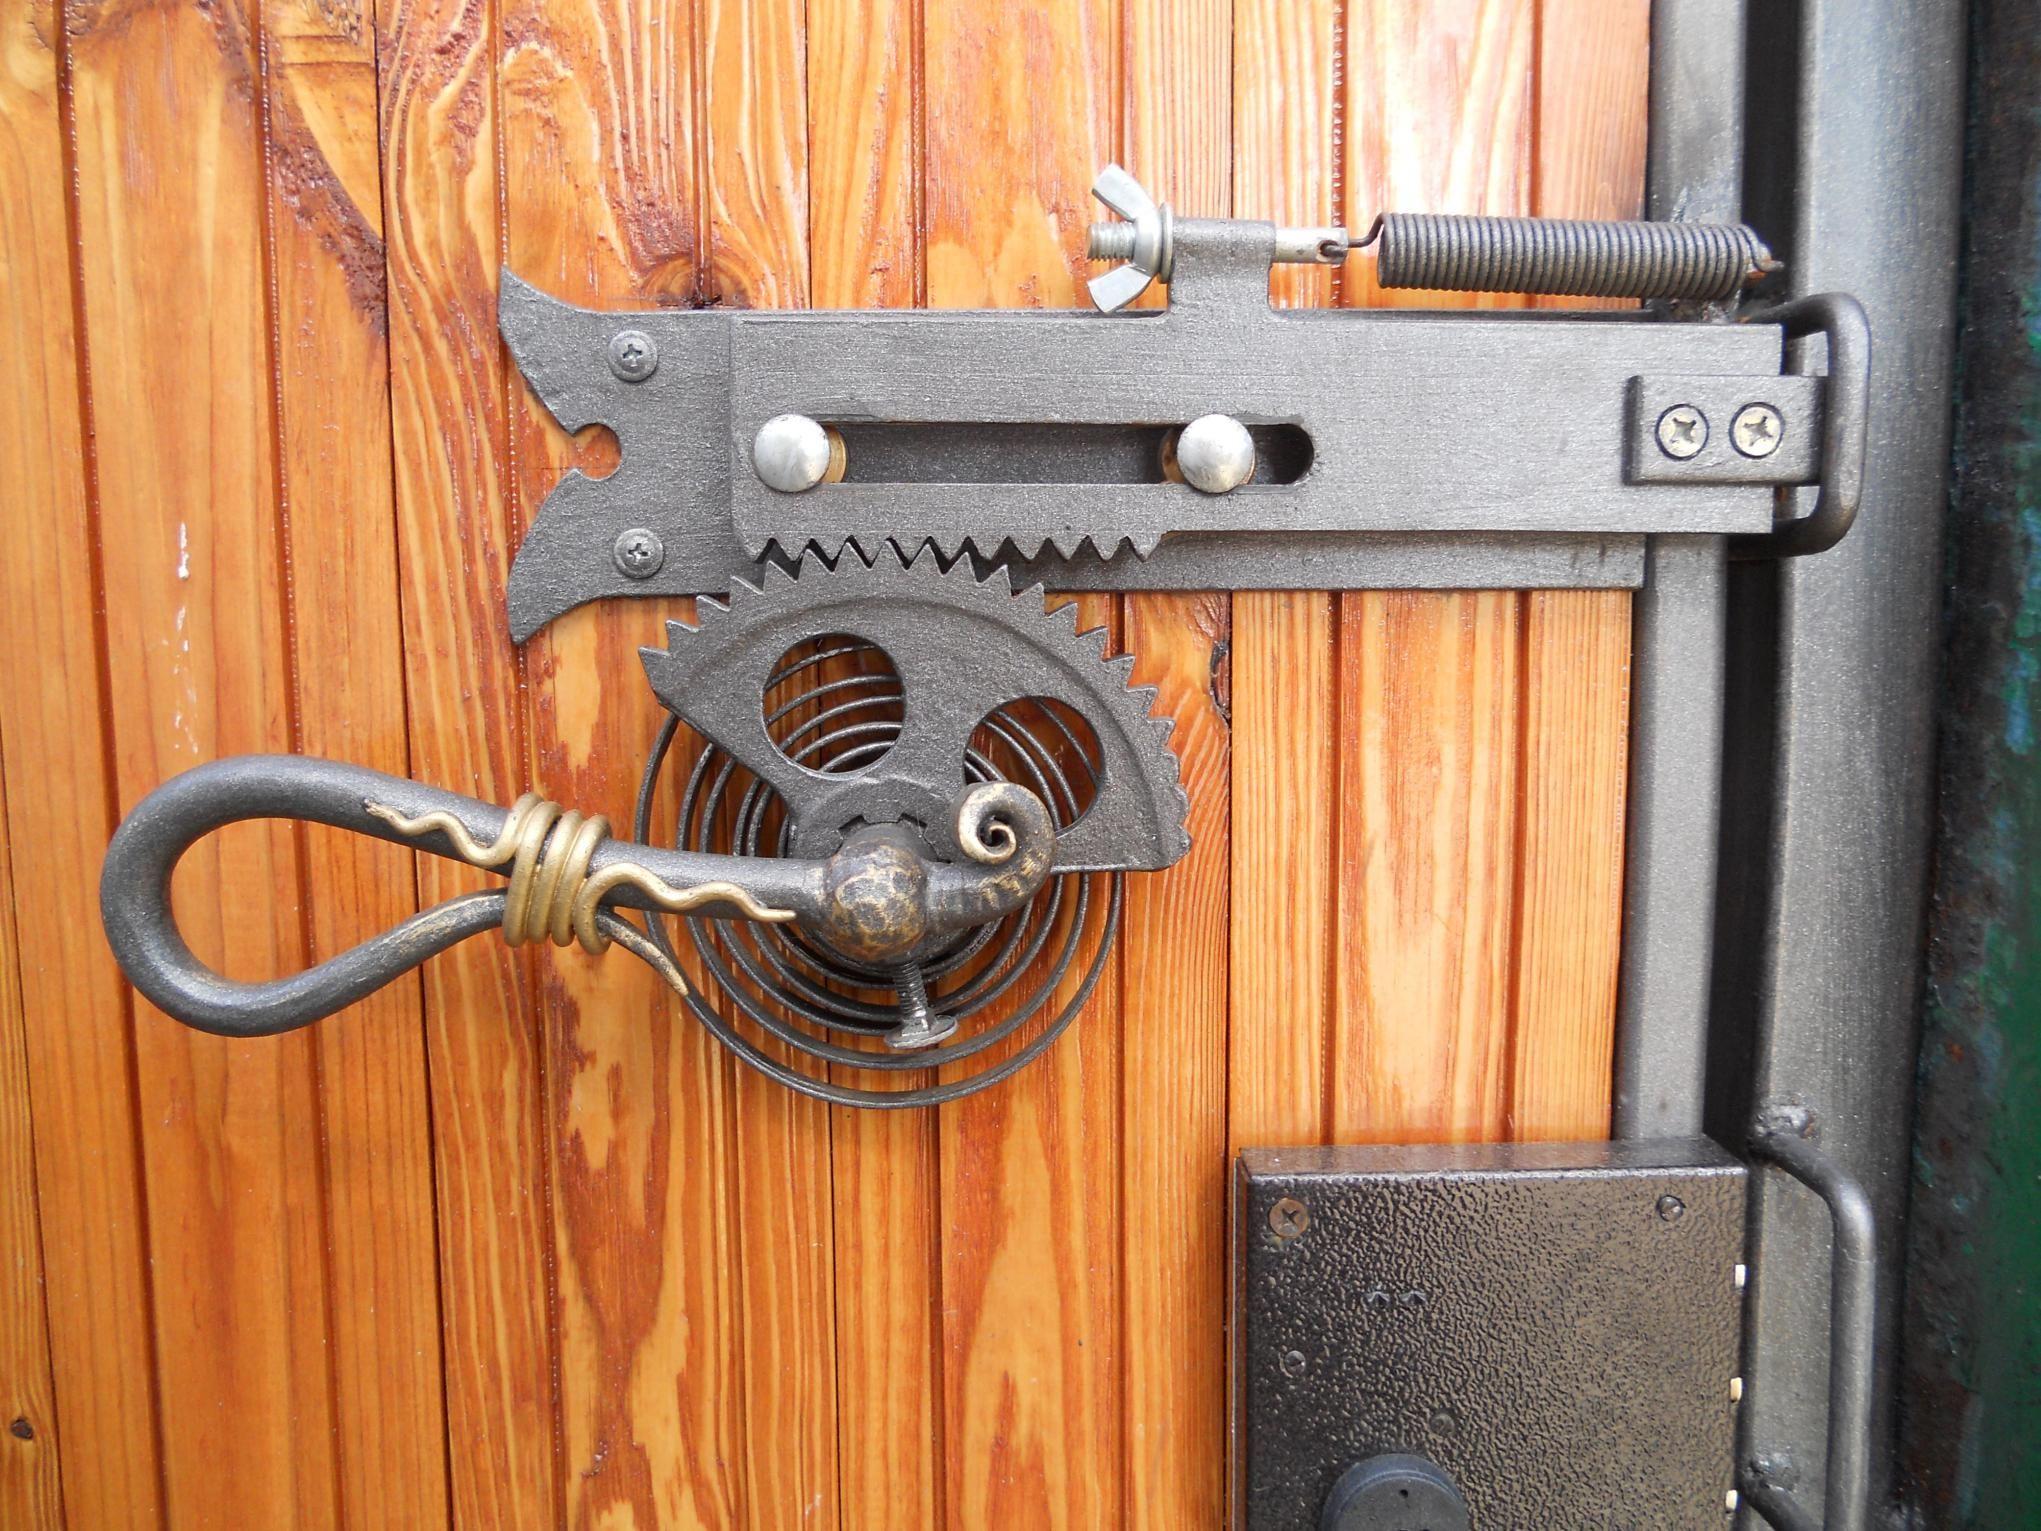 Crazy Metal Lock Metal Work Locks Locksmithing Handle Steampunk With Images Blacksmithing Woodworking Projects Metal Working